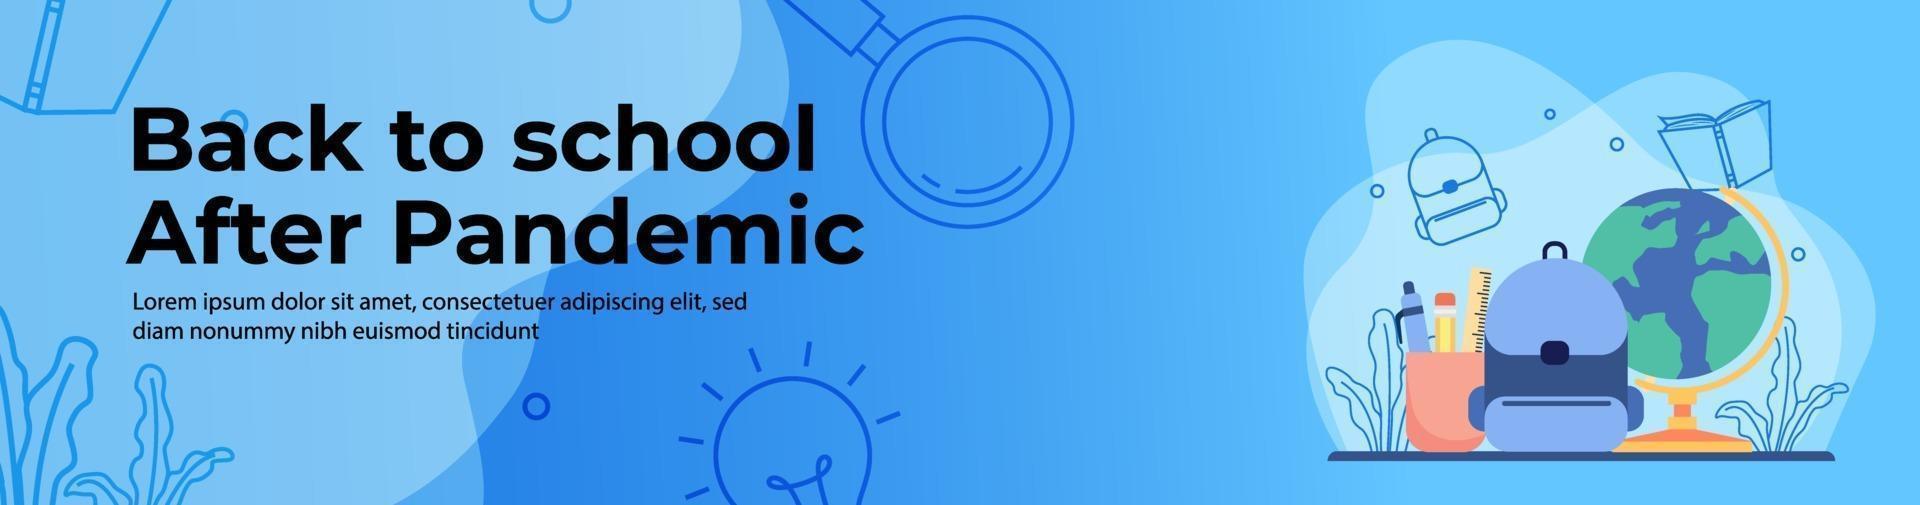 Education Web Banner Design vector